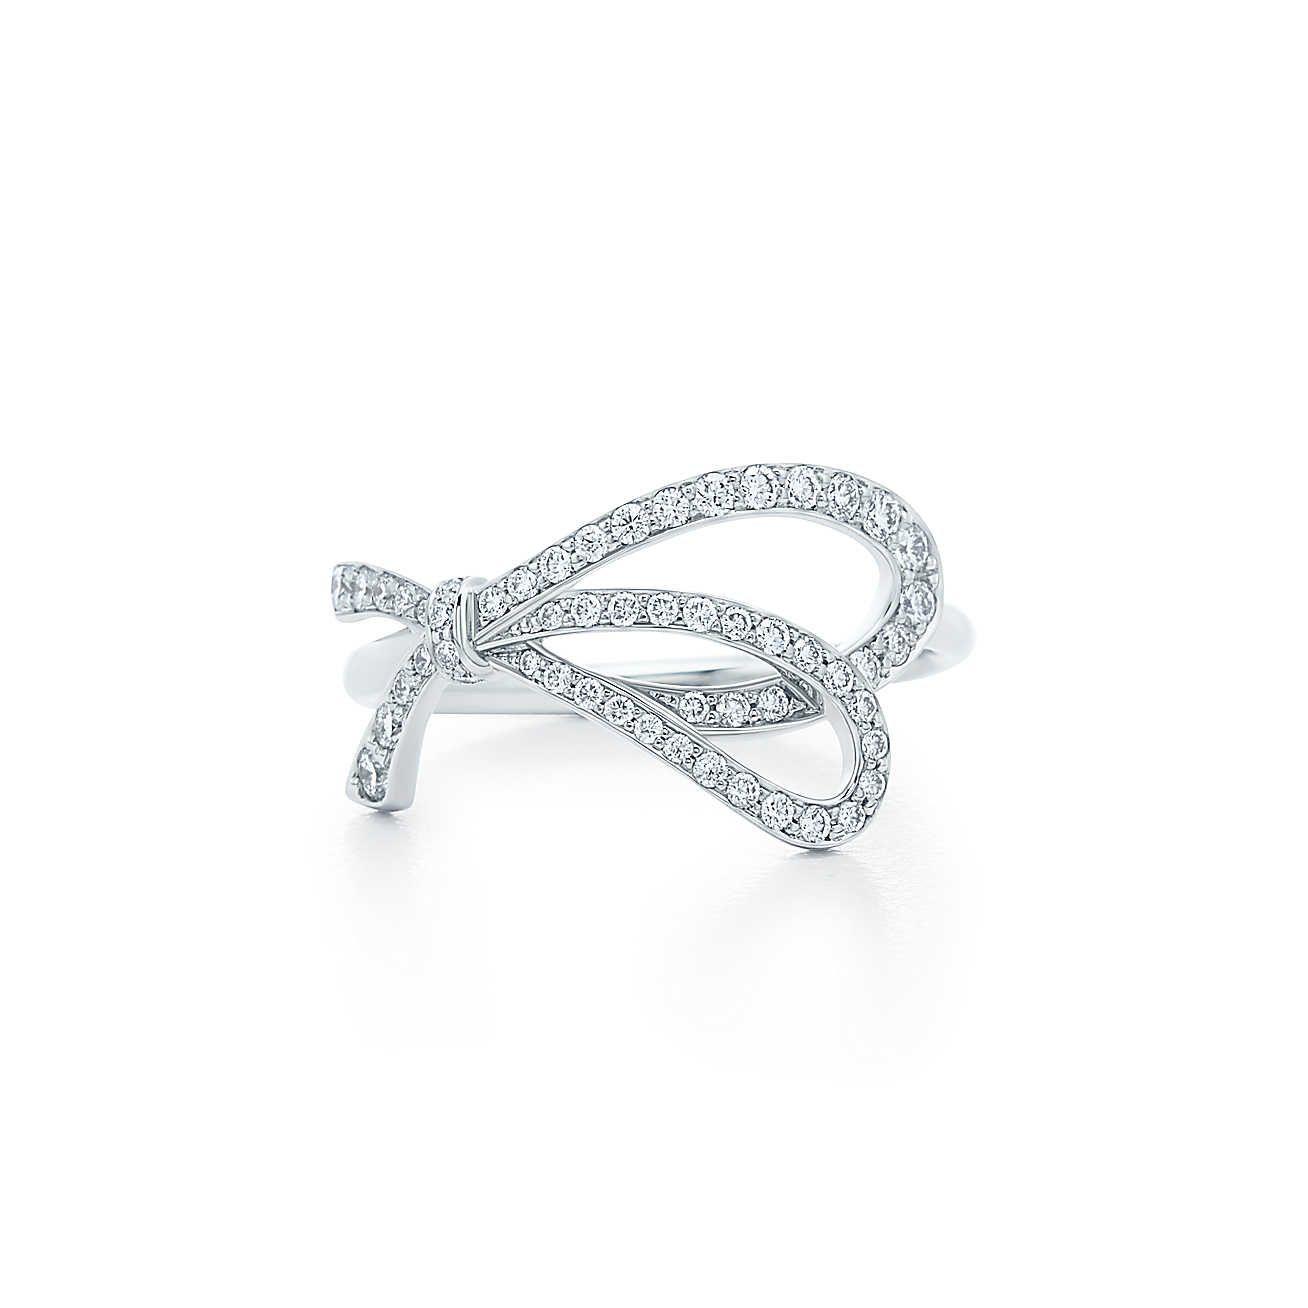 308bb51b2ad35 Ring in 2019   C-899   Tiffany infinity rings, Tiffany rings ...